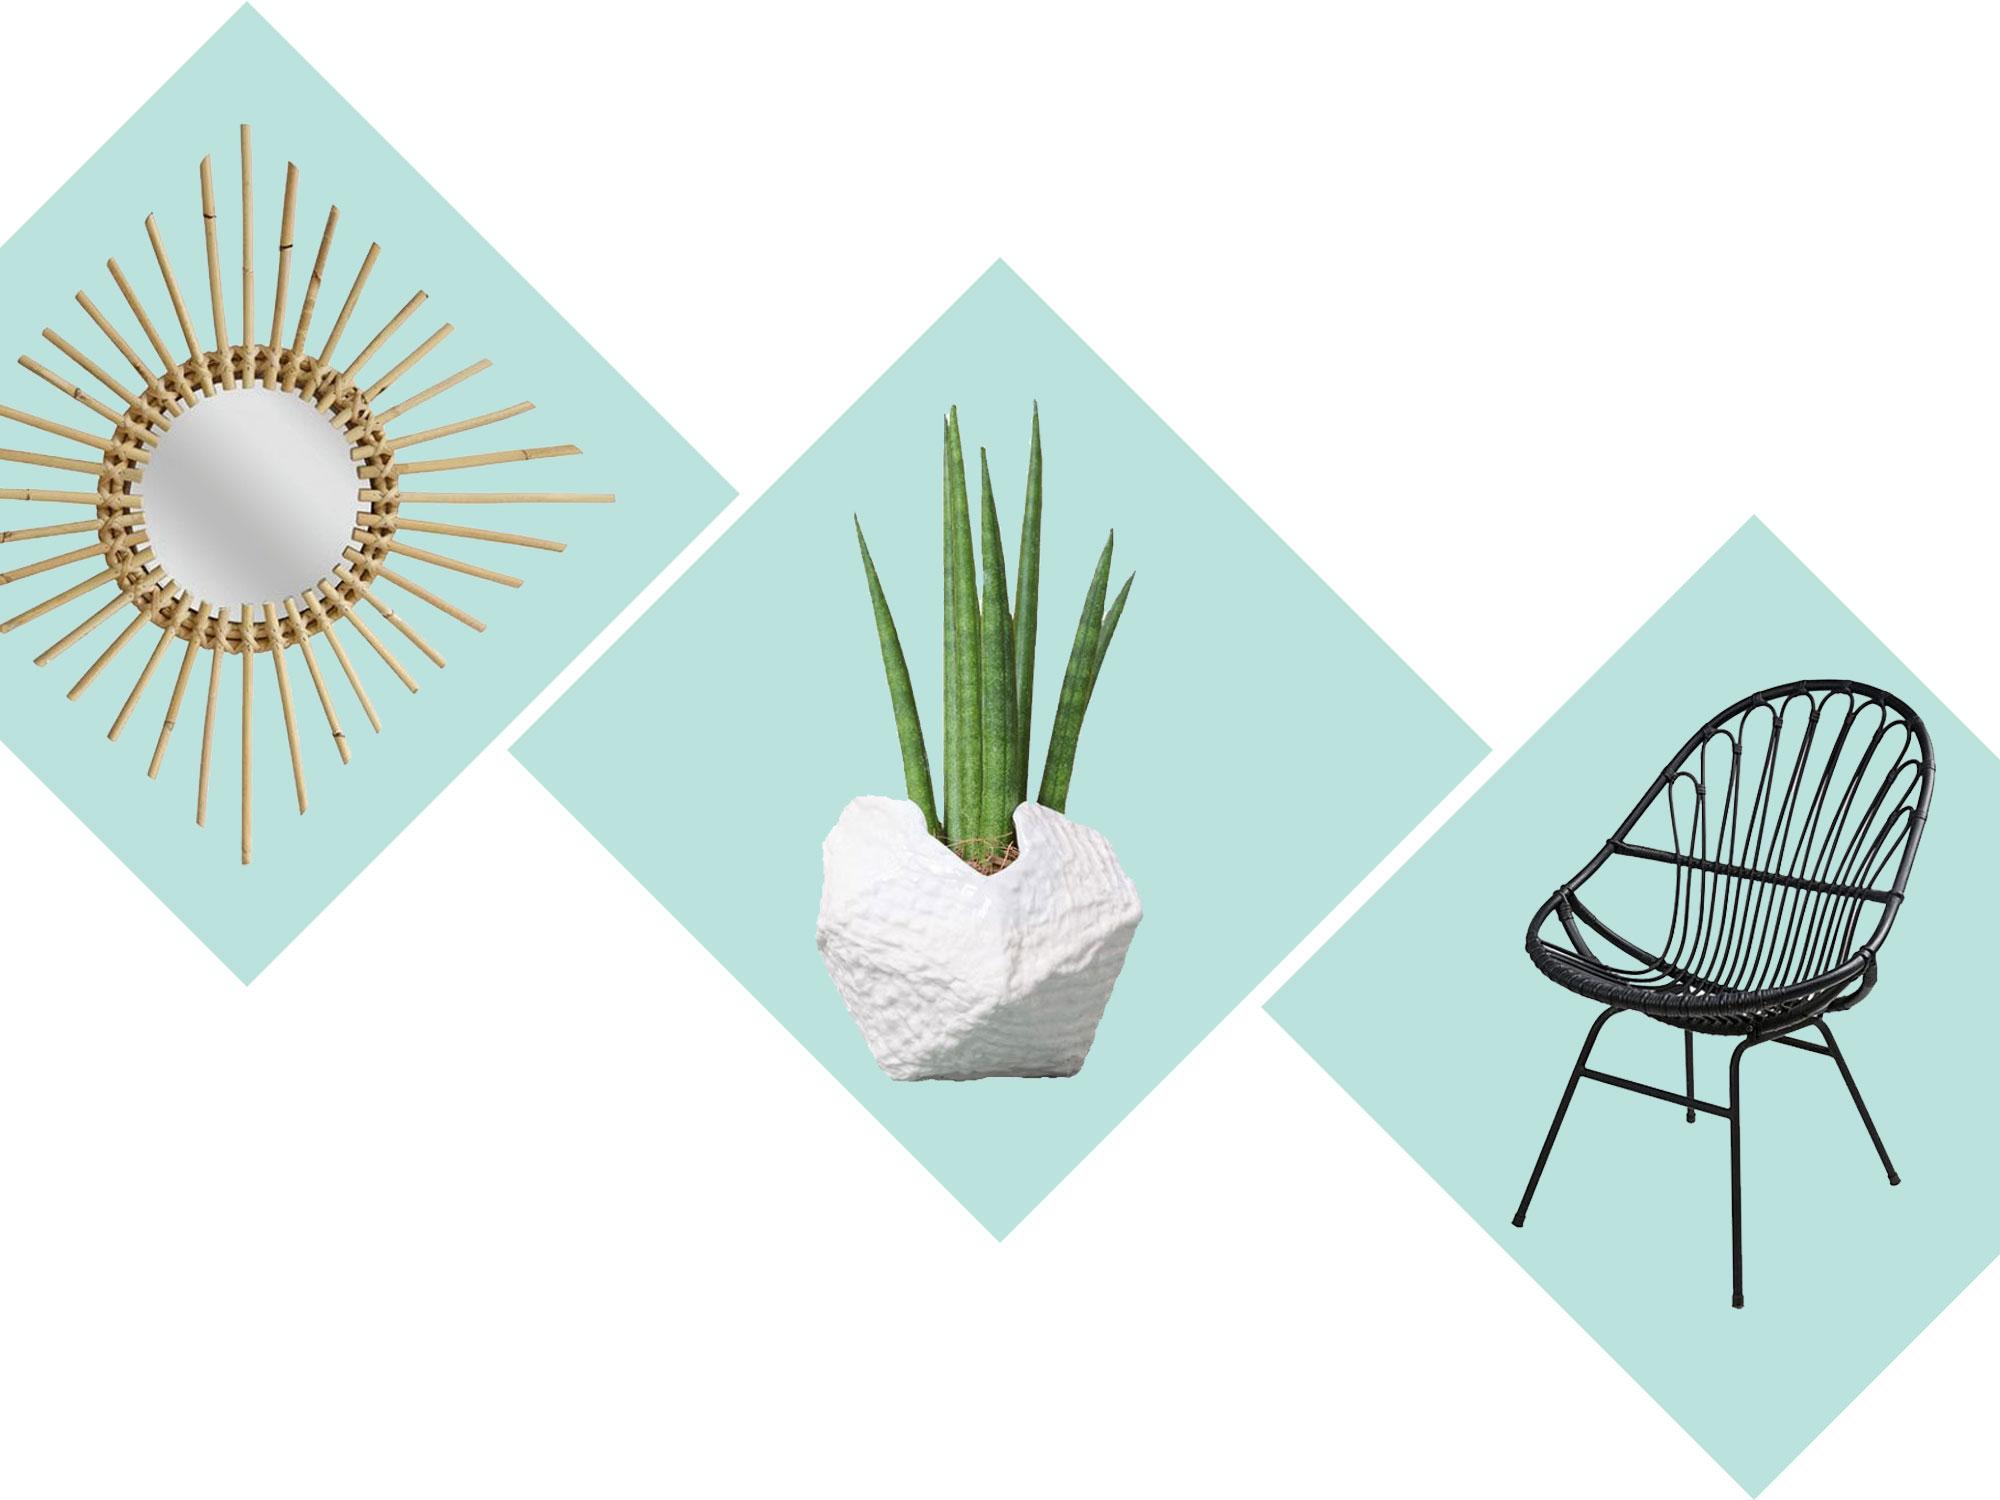 30 objets d co moins de 100 euros d co id es. Black Bedroom Furniture Sets. Home Design Ideas